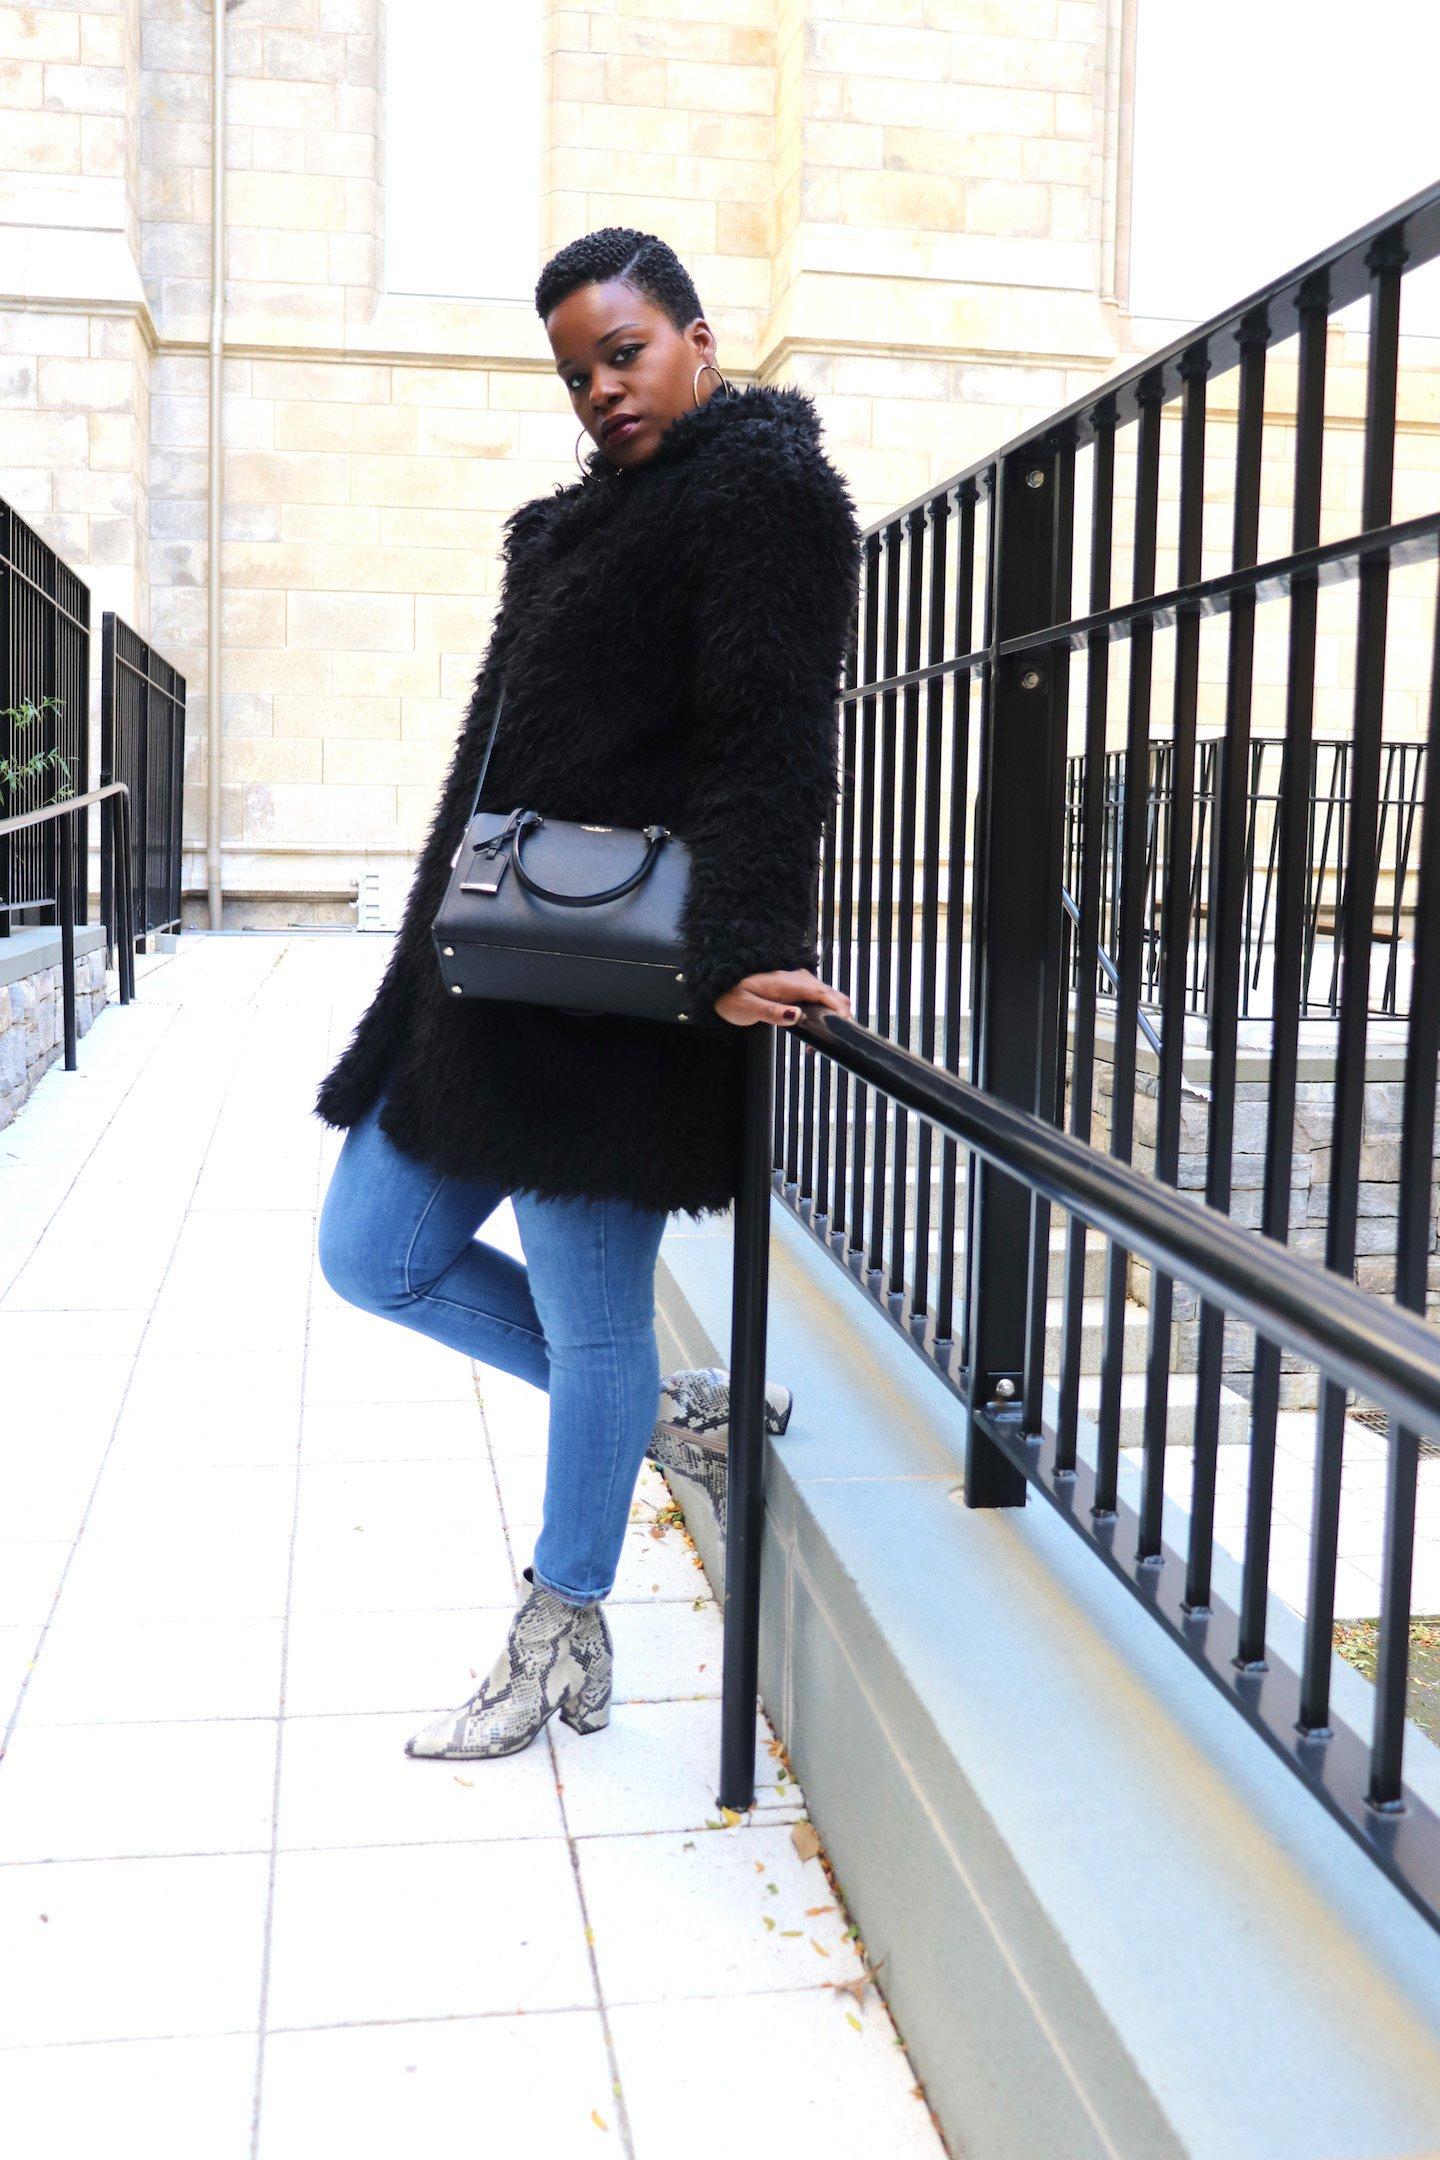 Kate Spade Large Lane Bag Faux Fur Coat Snakeskin Boots Outfit